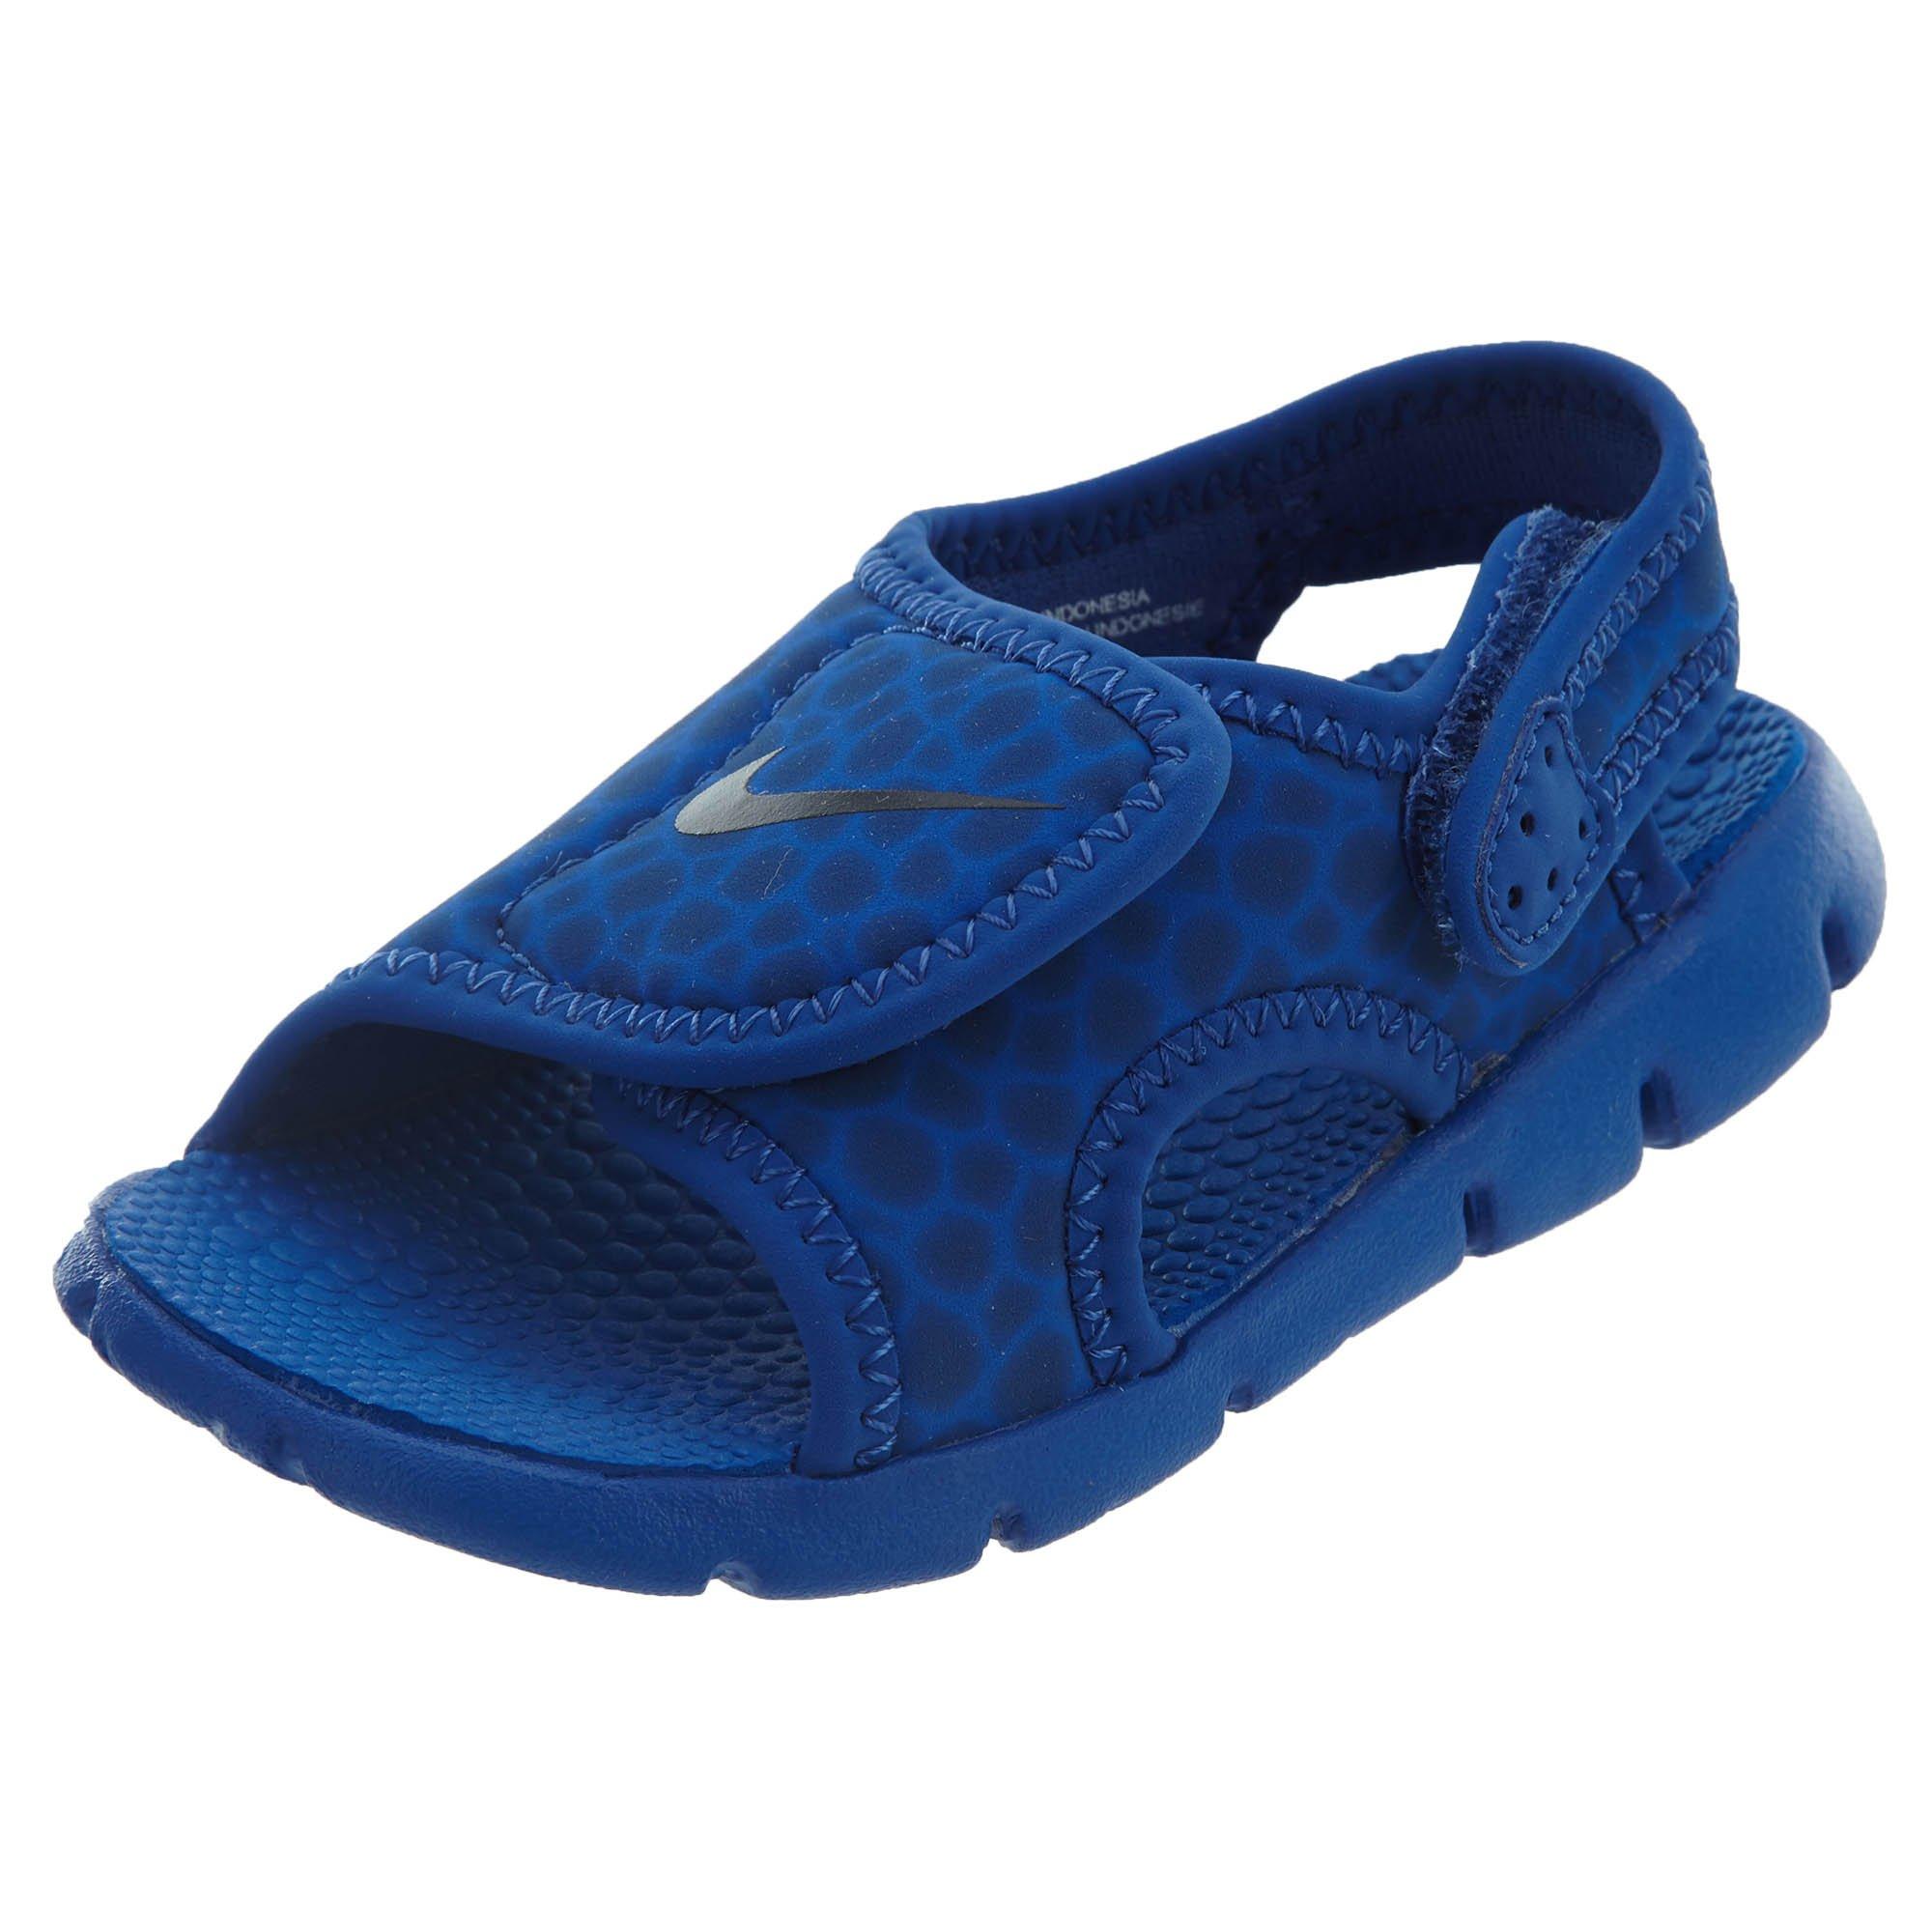 Nike 386519-414: Sunray Adjust 4 Boys Game Royal Sandals (10 M US Toddler)